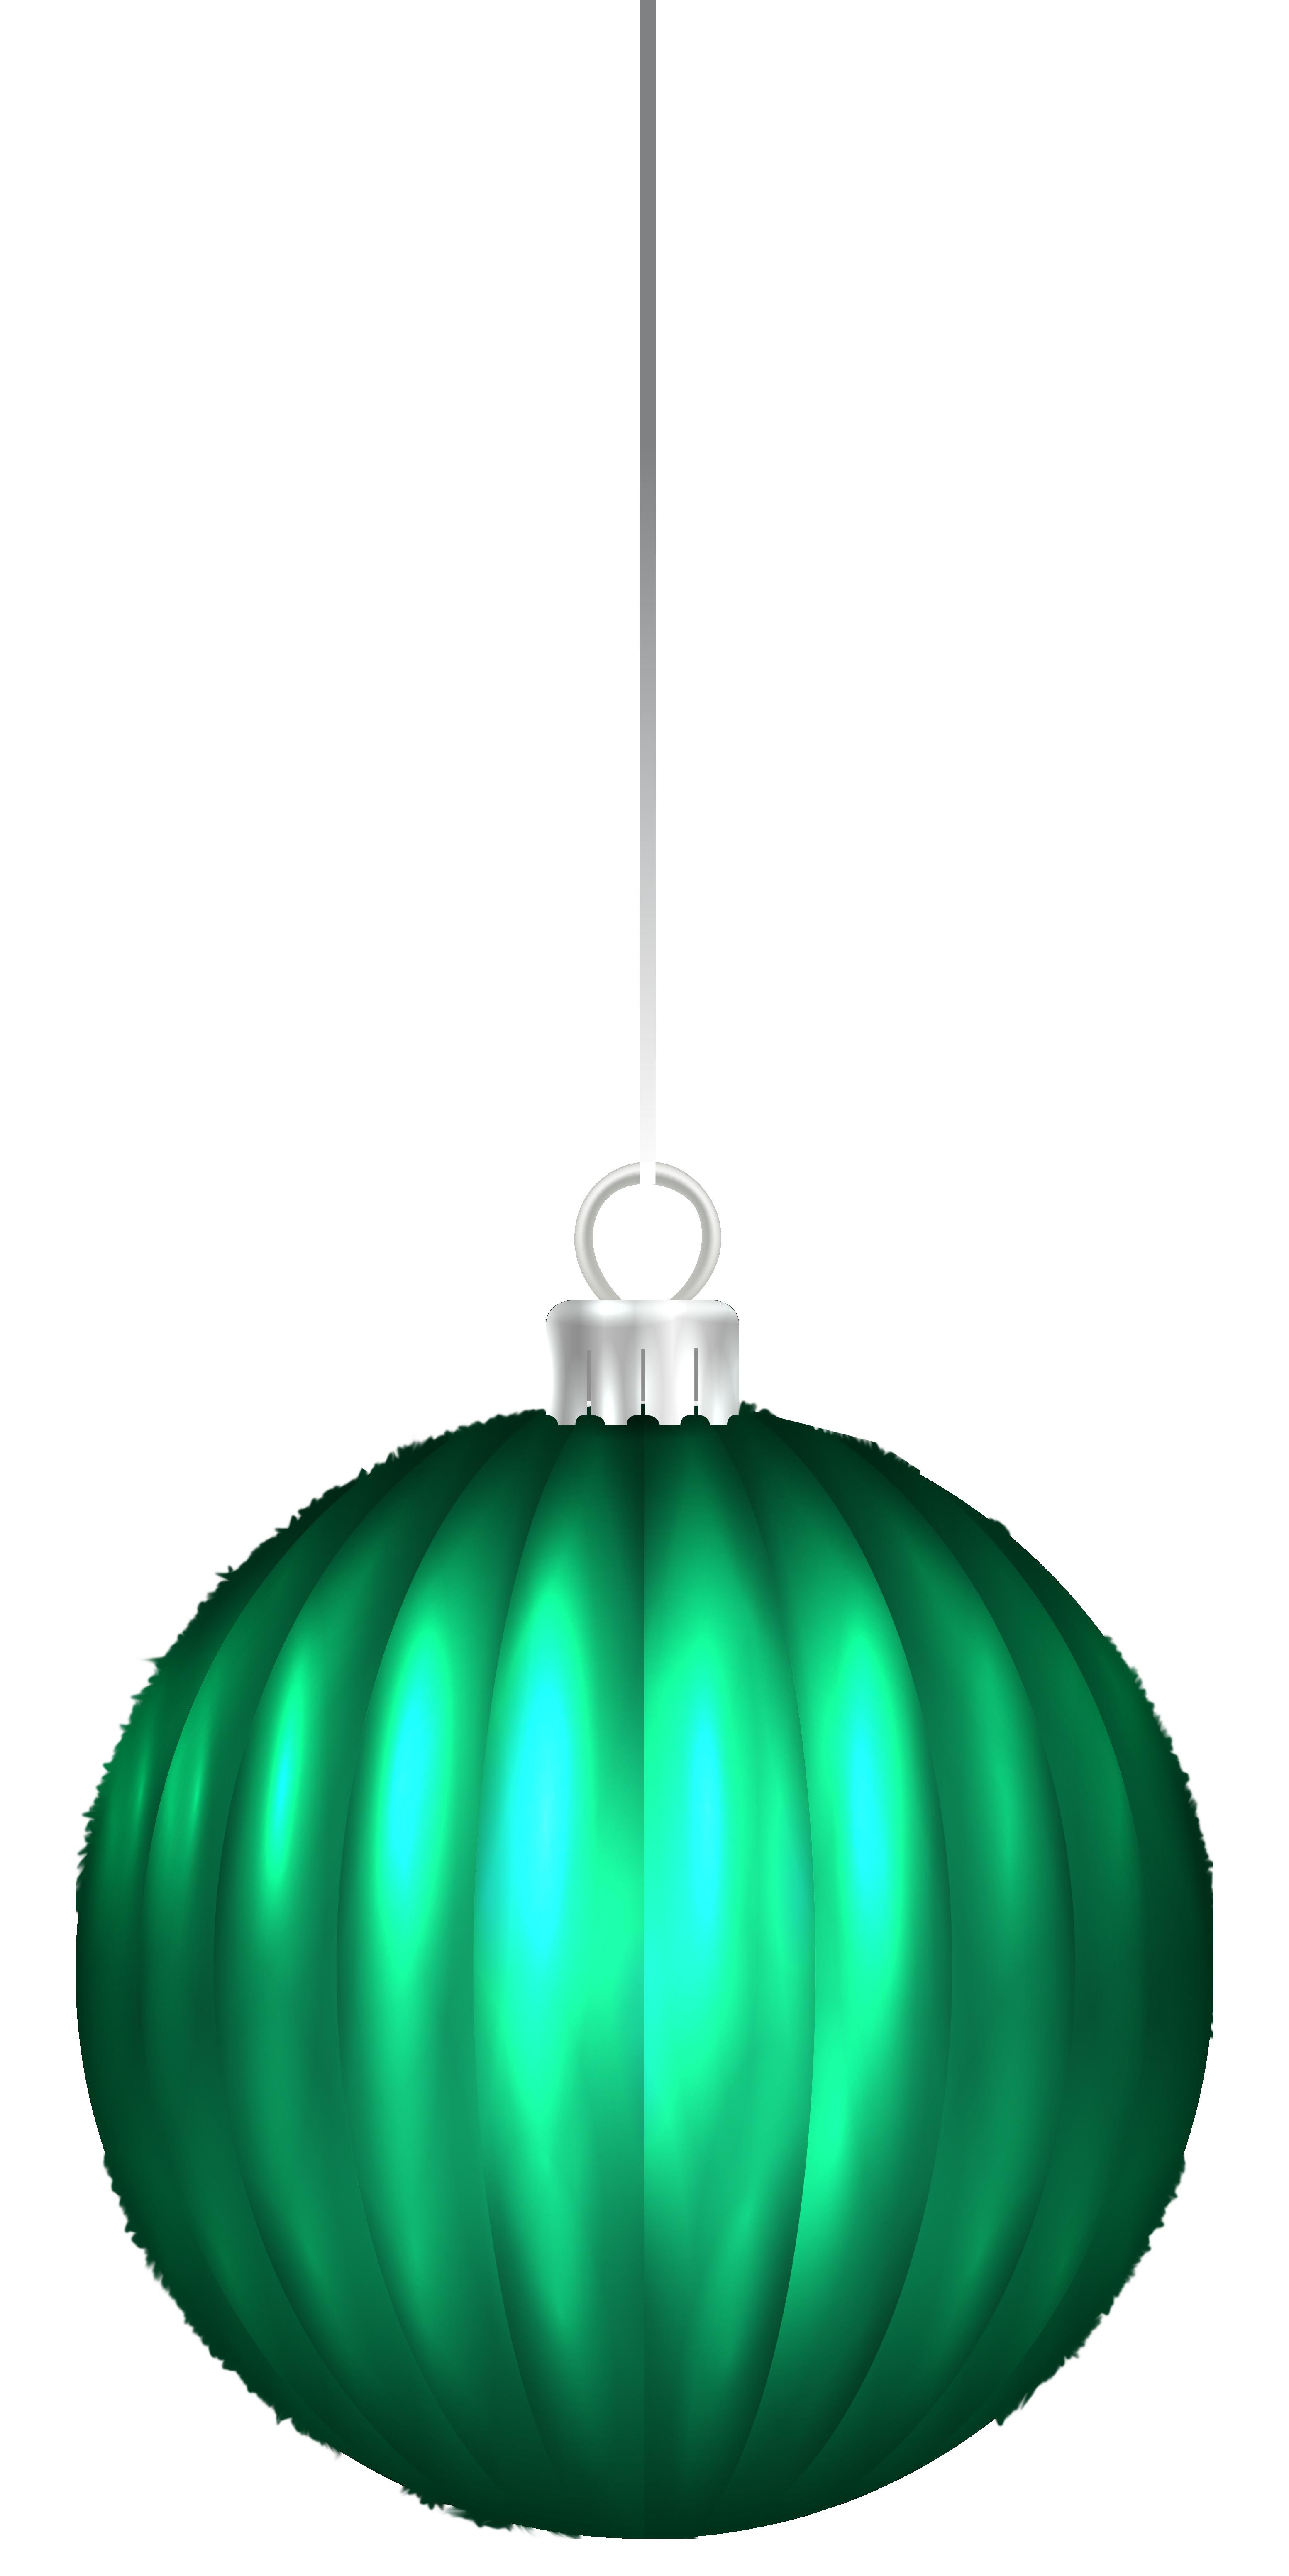 Green Christmas Ball Ornament PNG Clip Art Image.